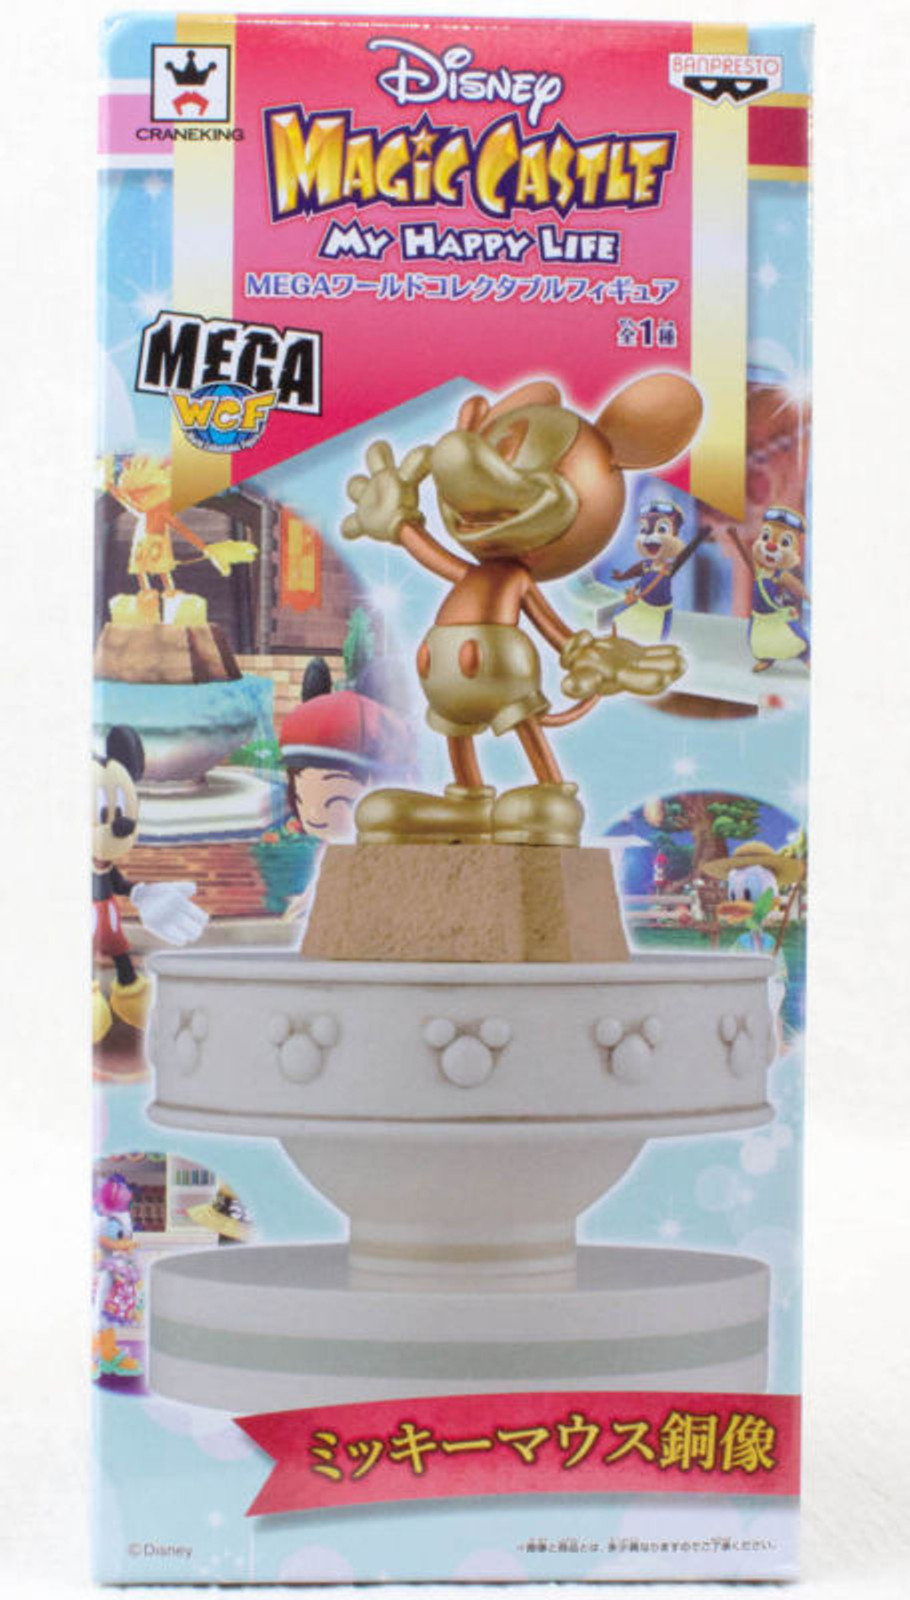 Disney Mickey Mouse Statue Figure Magic Castle Mega WCF Banpresto JAPAN